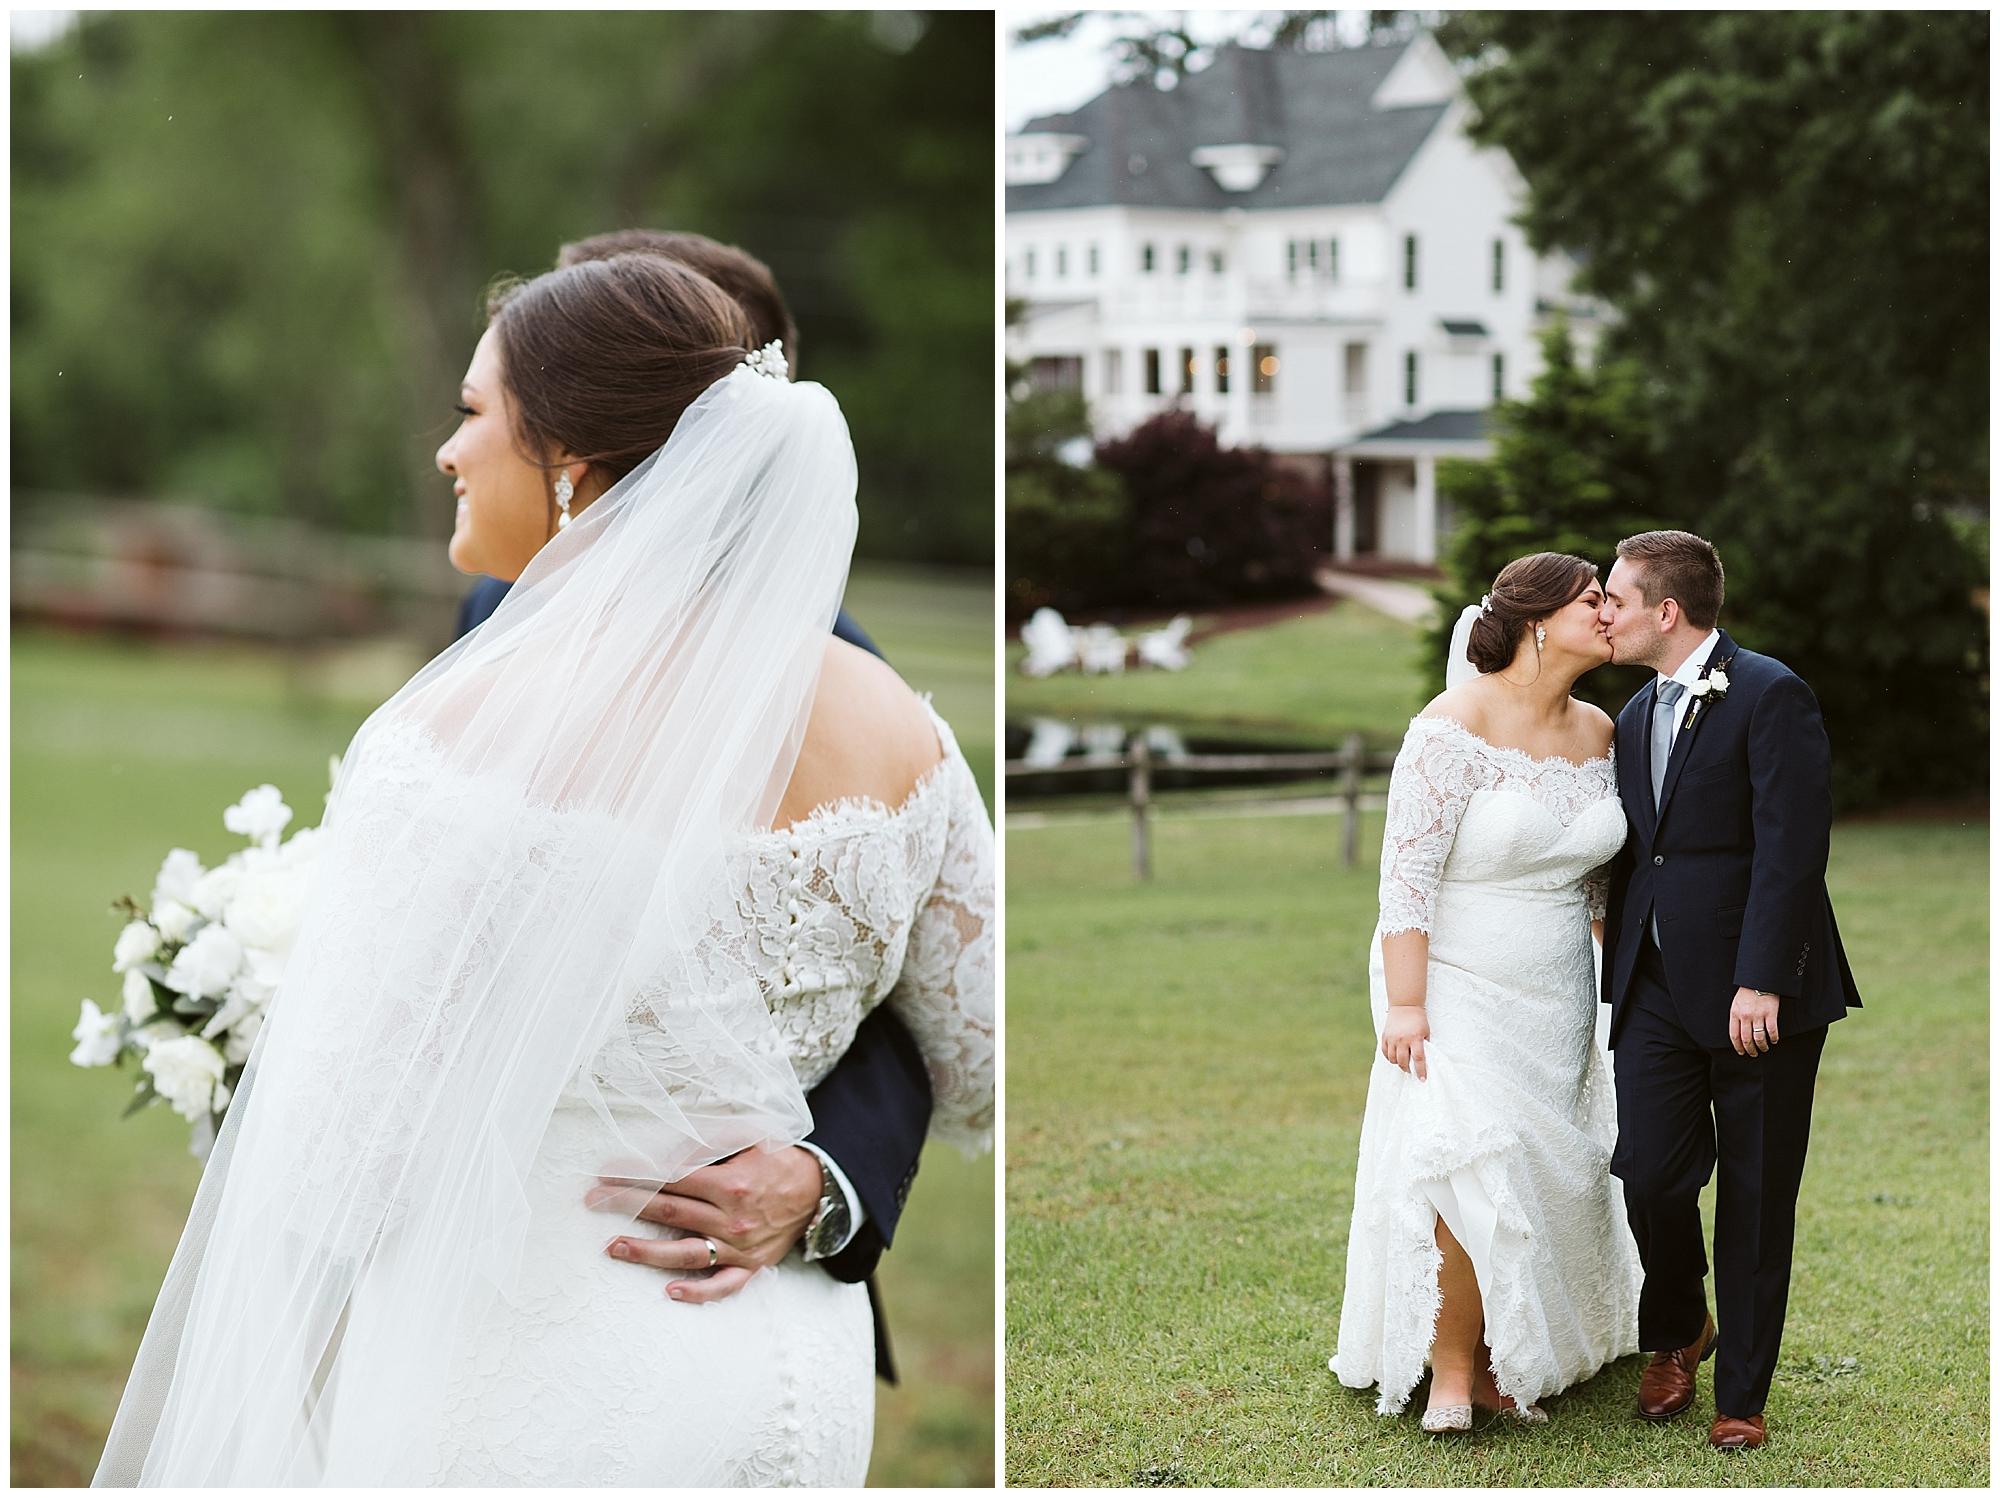 Oaks-at-salem-wedding-apex-photography-78.jpg